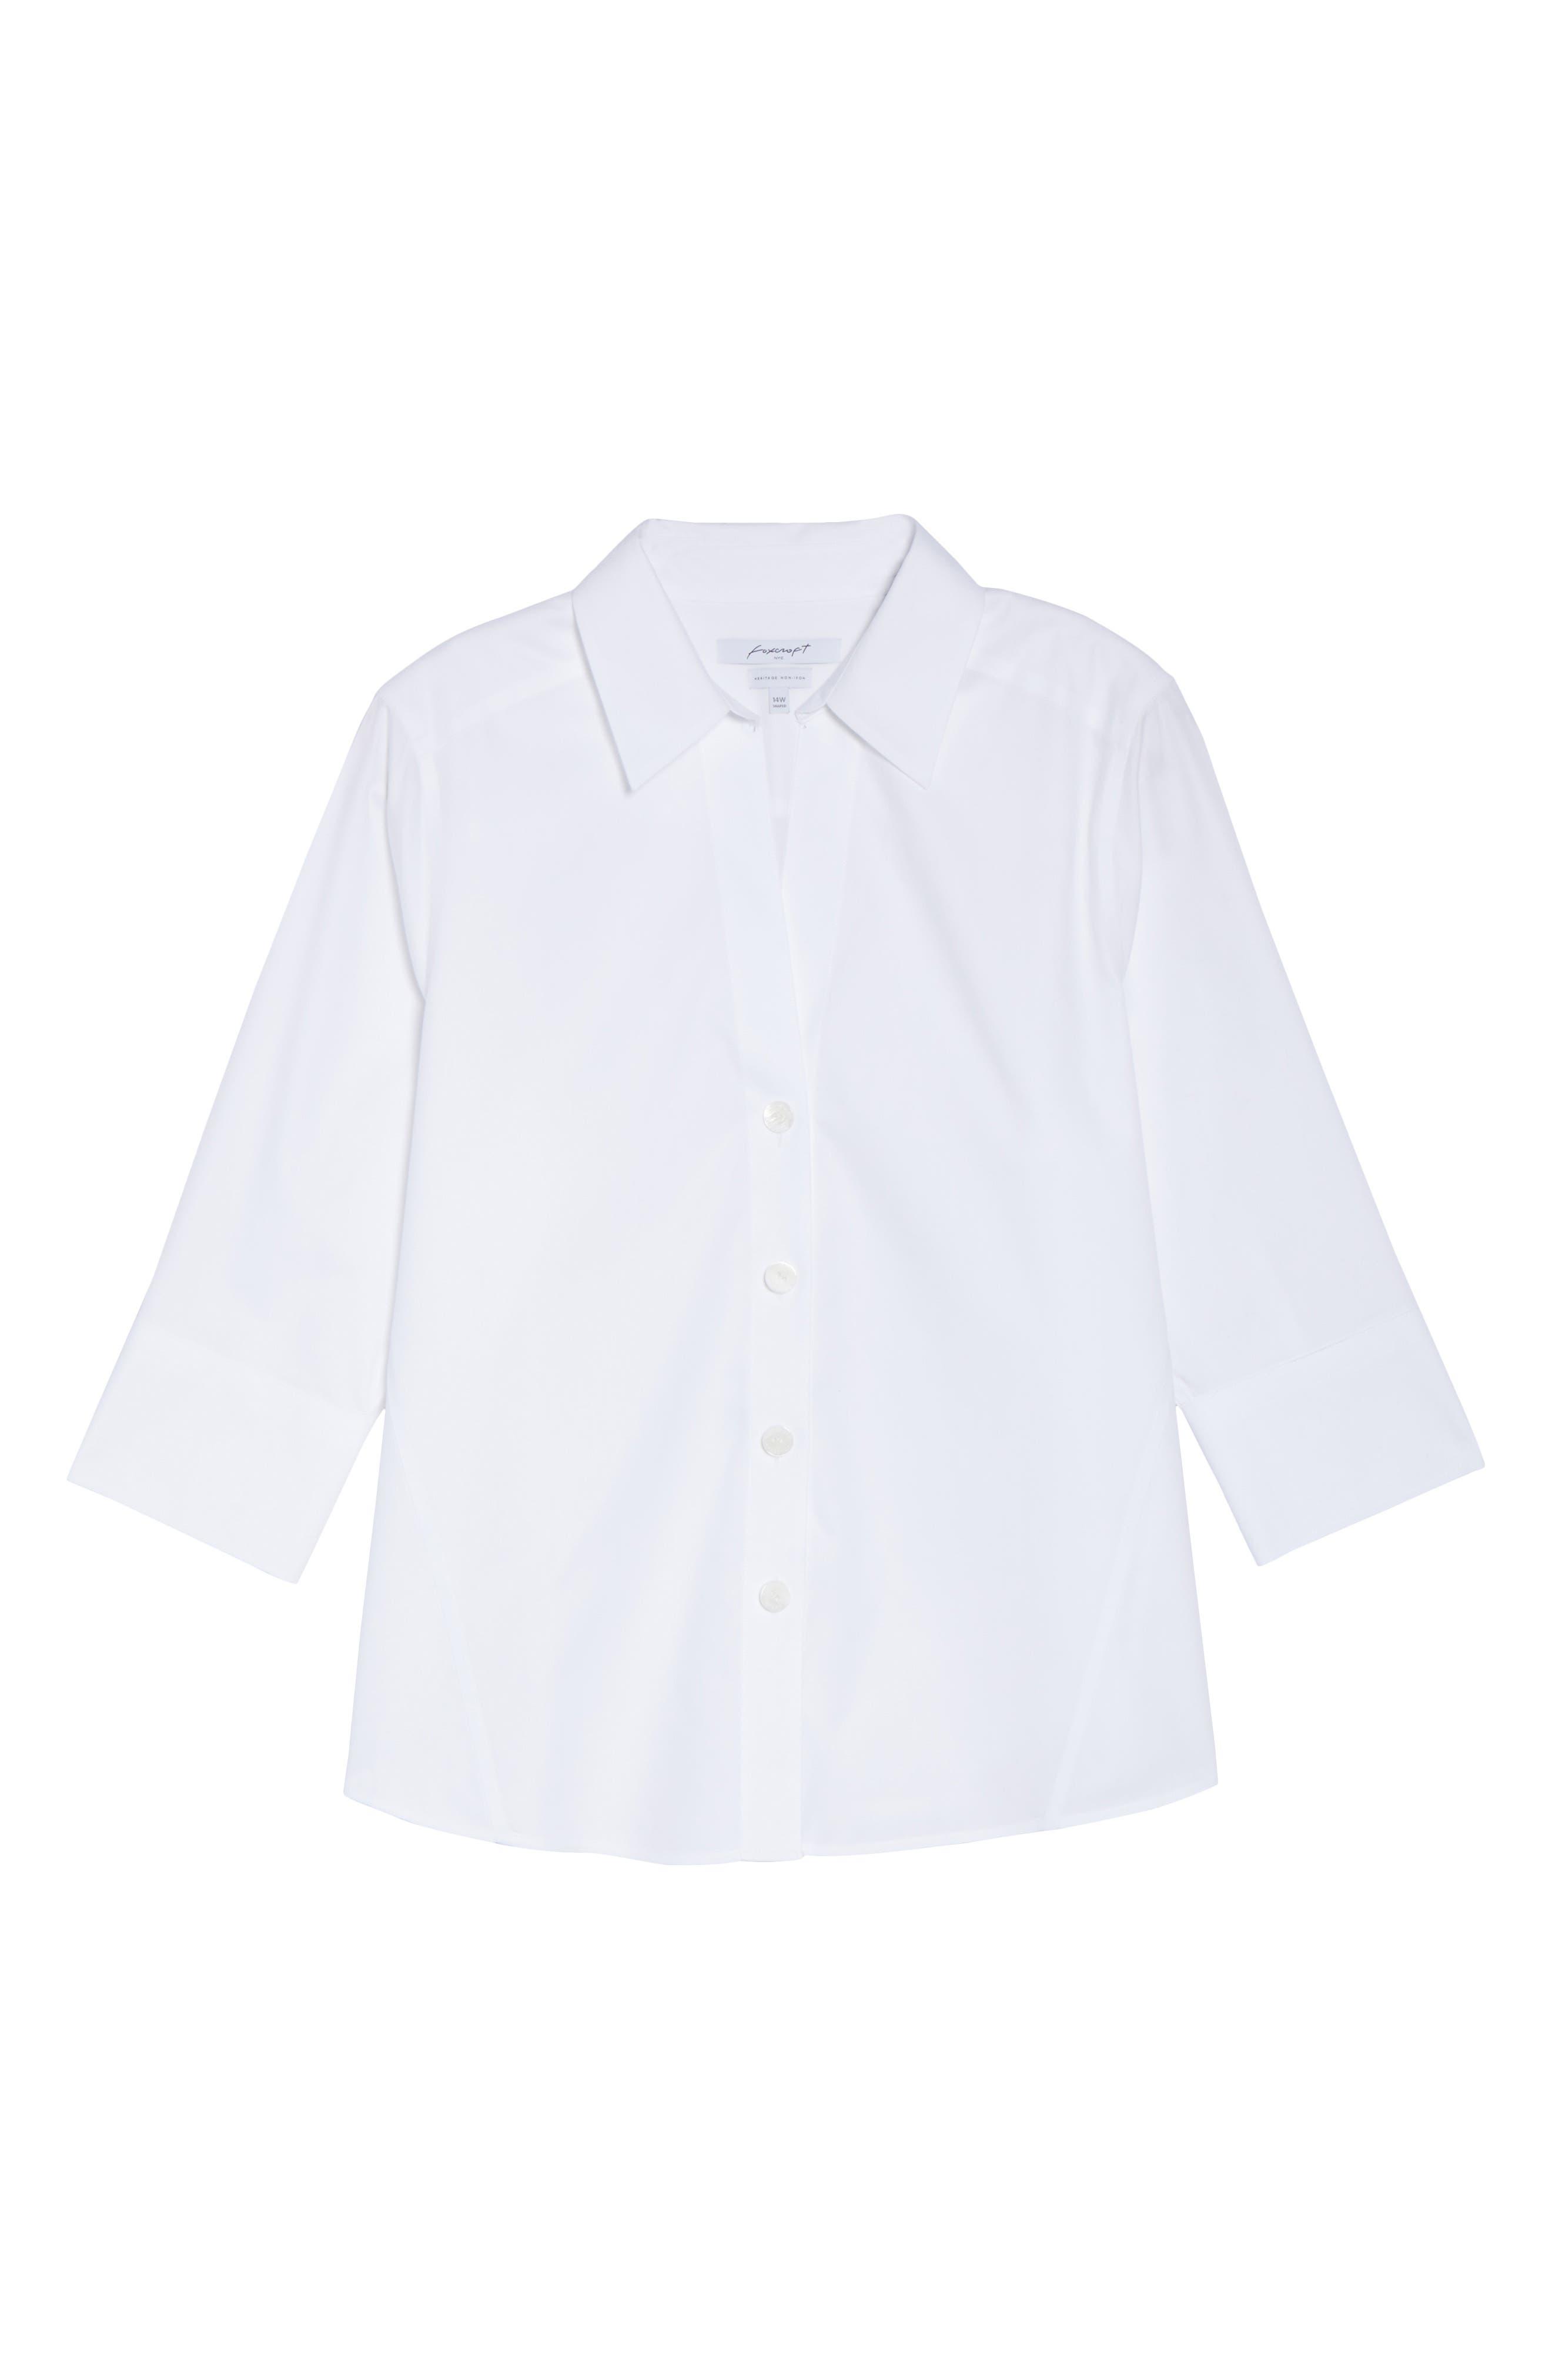 Paige Non-Iron Cotton Shirt,                             Alternate thumbnail 2, color,                             WHITE